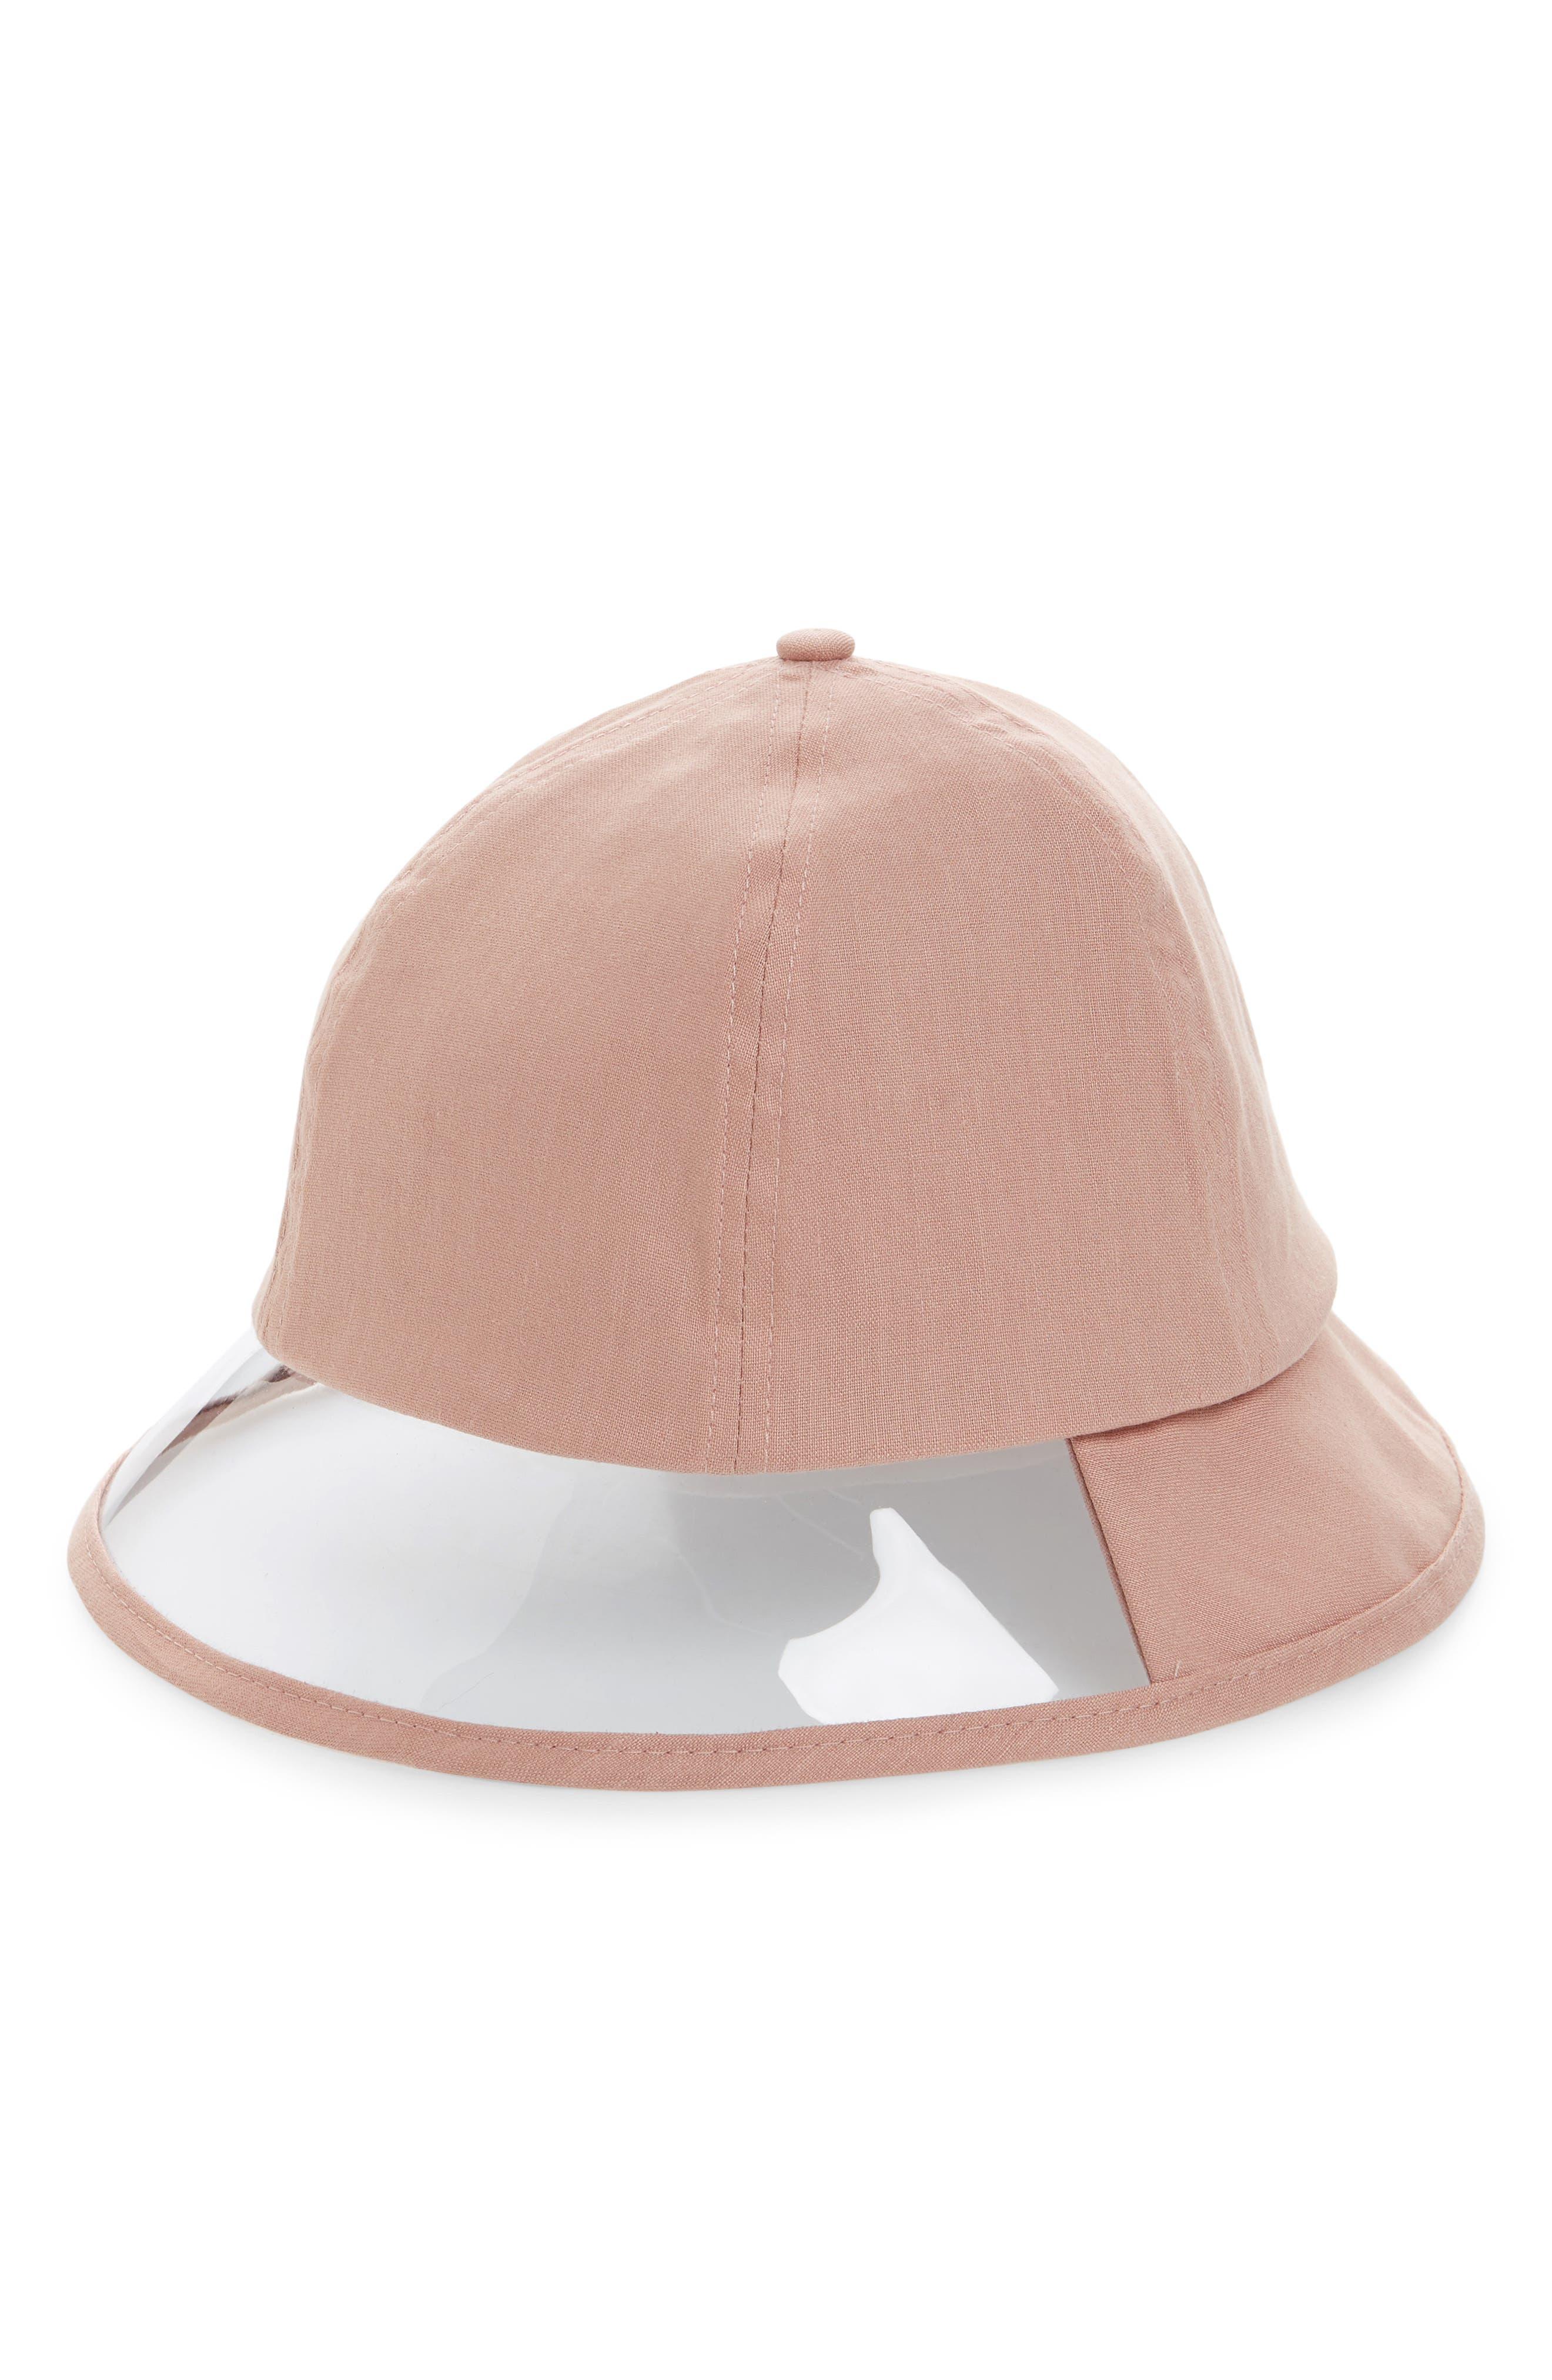 Transparent Panel Canvas Bucket Hat - Pink in Blush